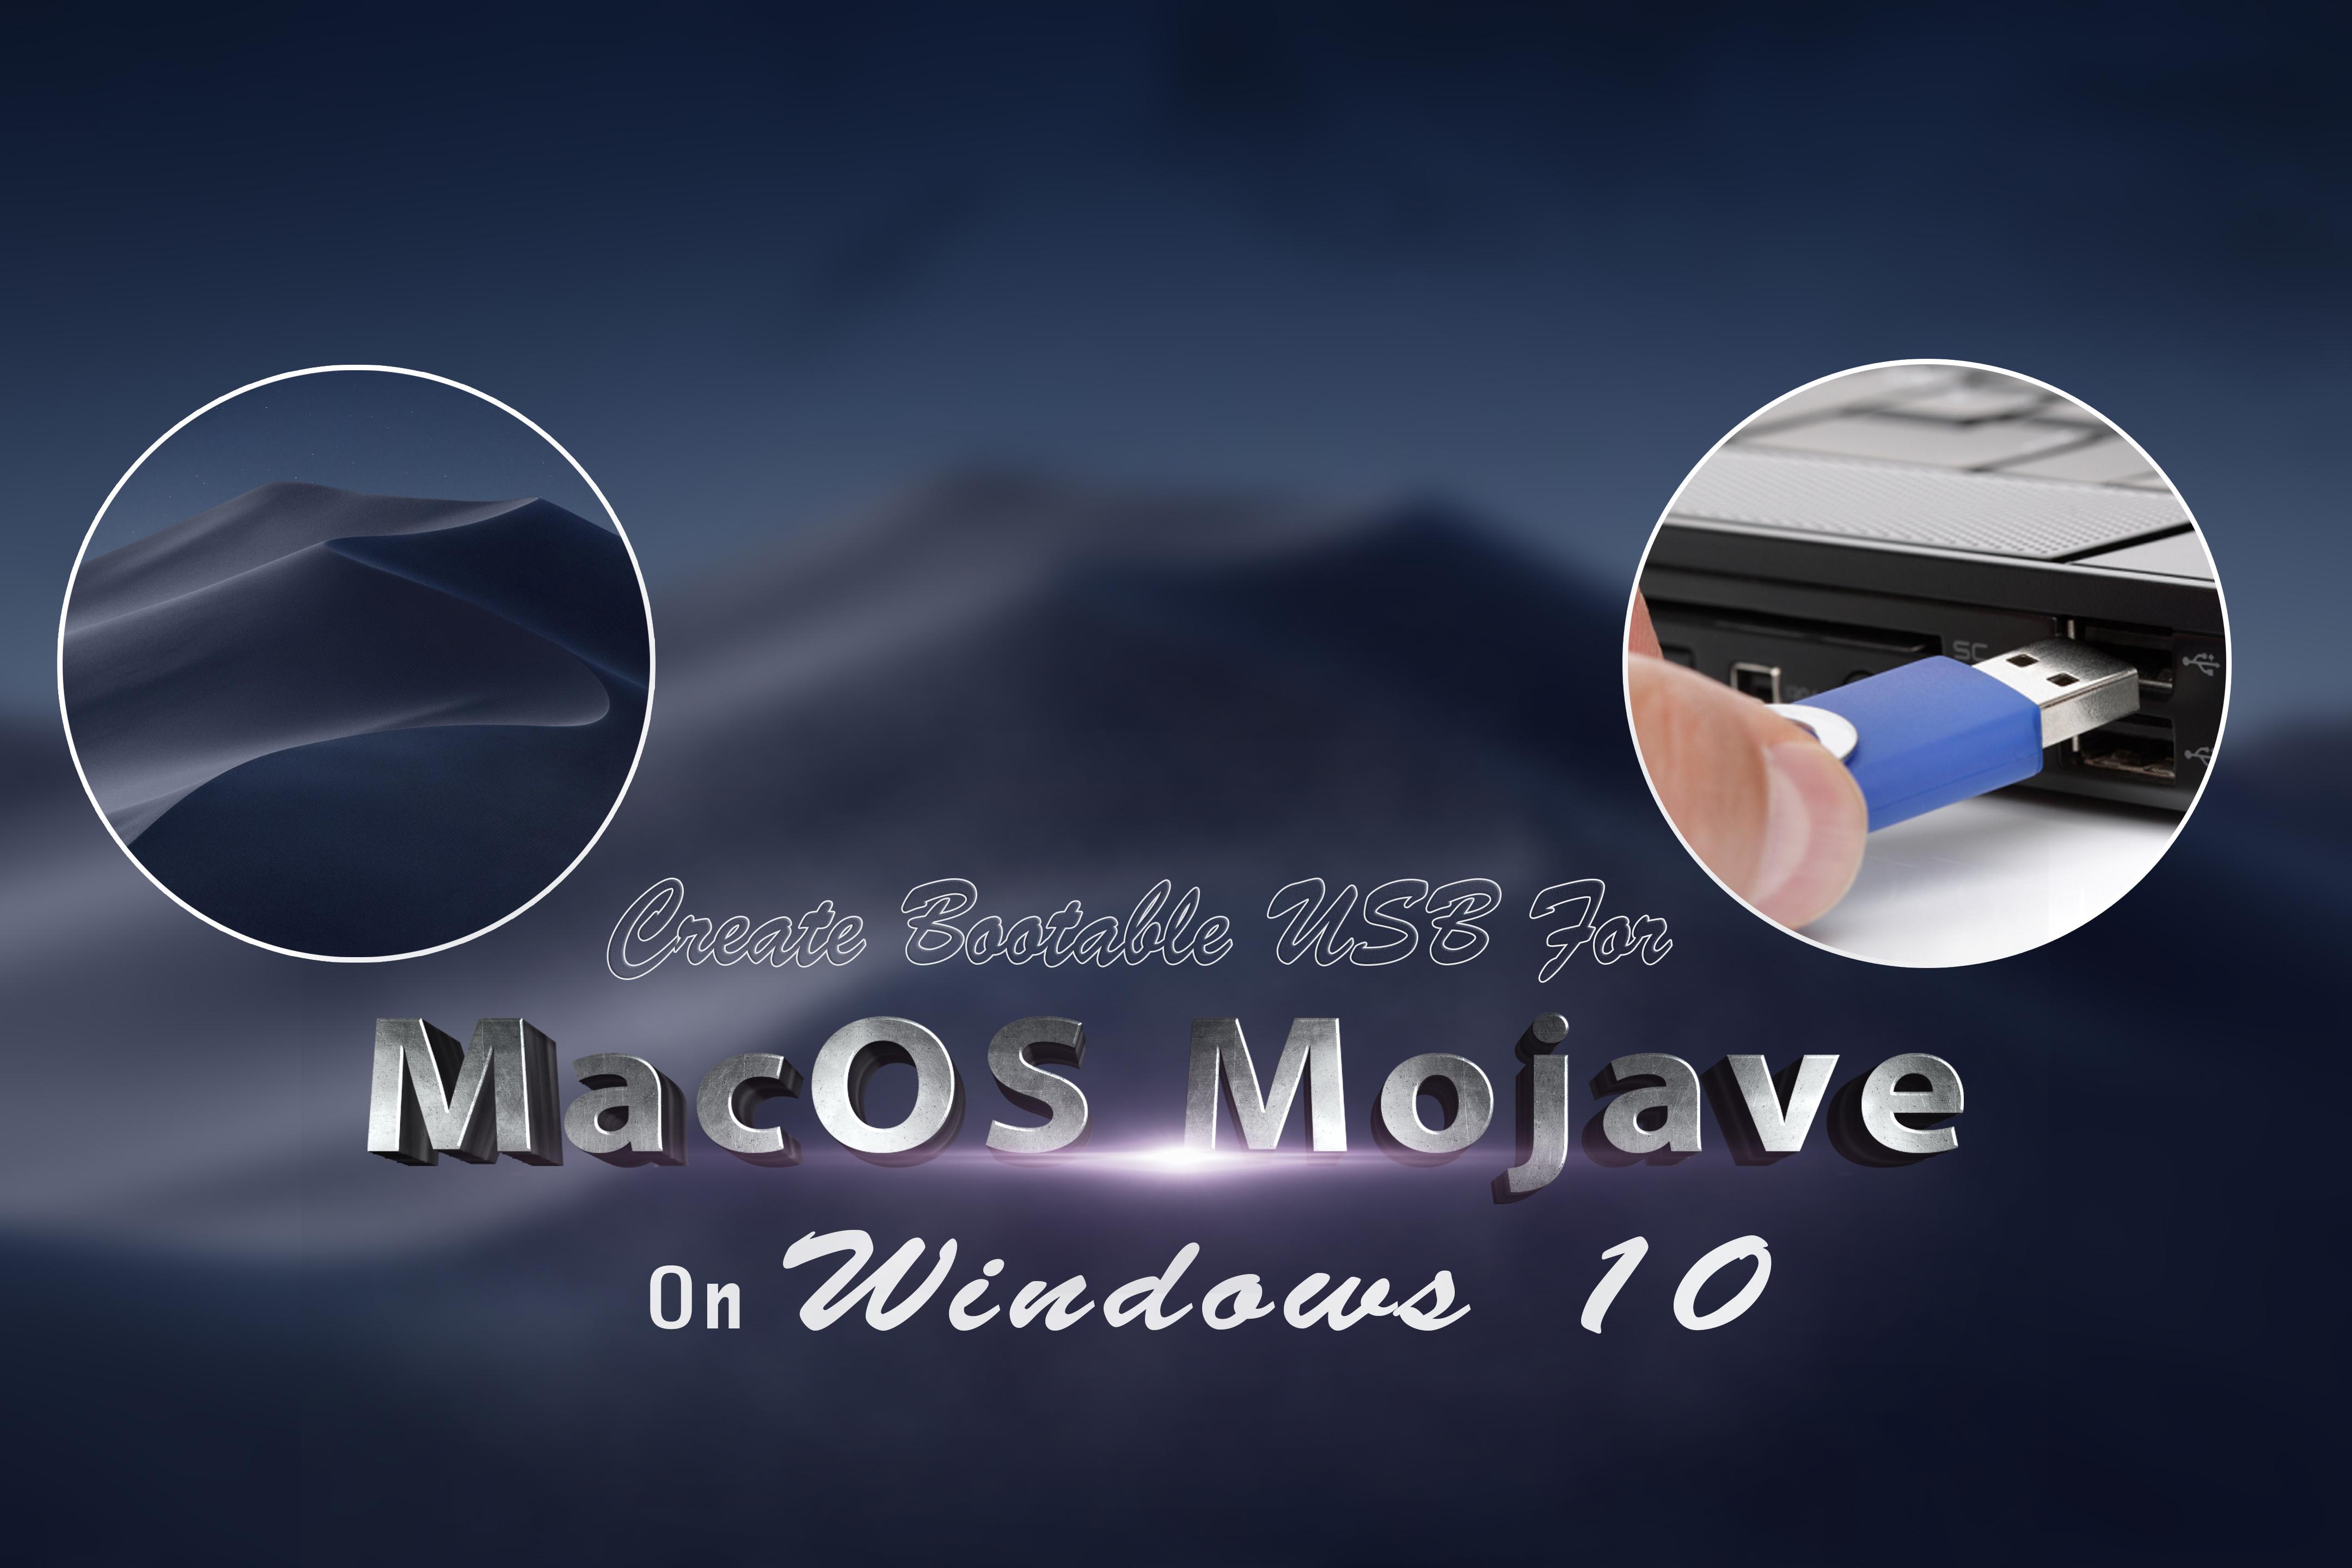 bootable usb mac os mojave on windows